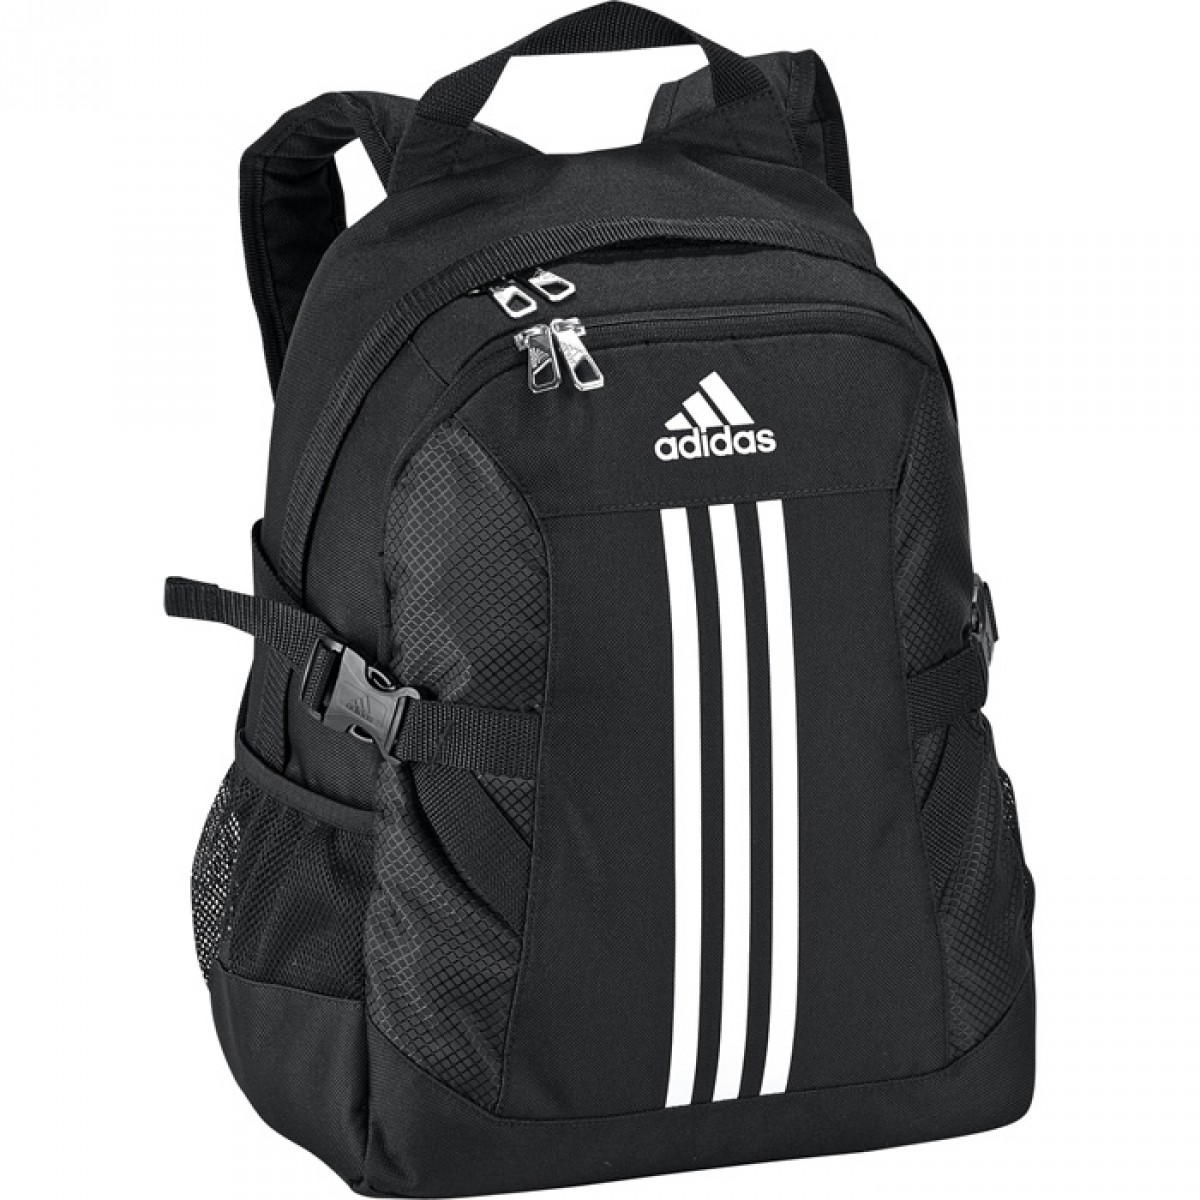 Okul Hediyen Adidas'tan 11